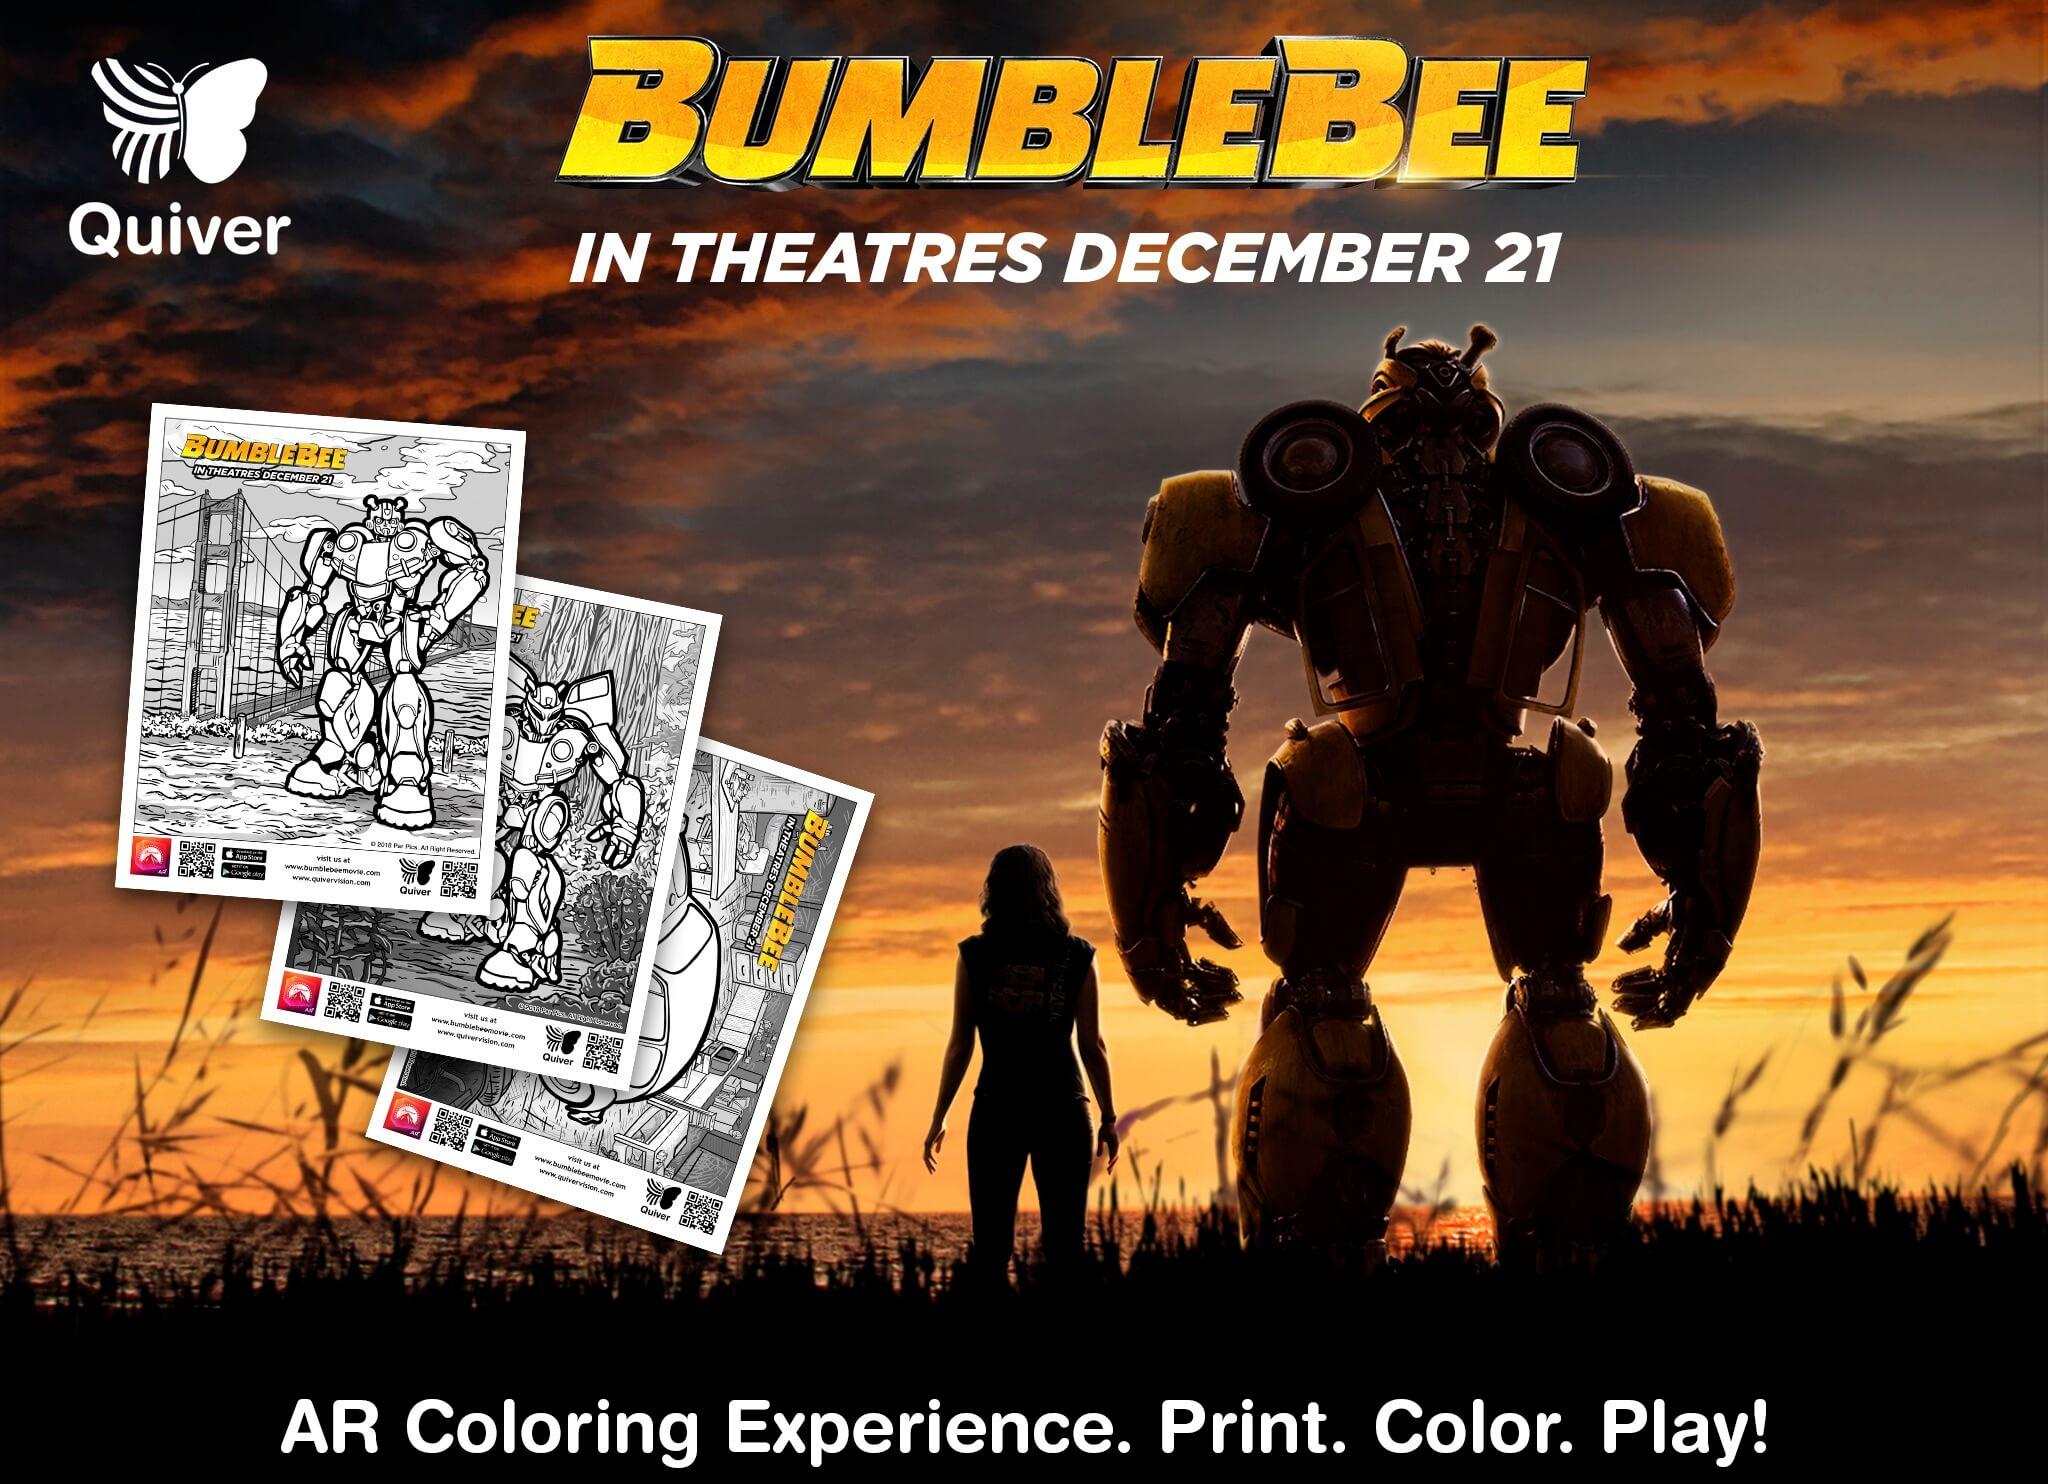 Bumblebee AR Coloring